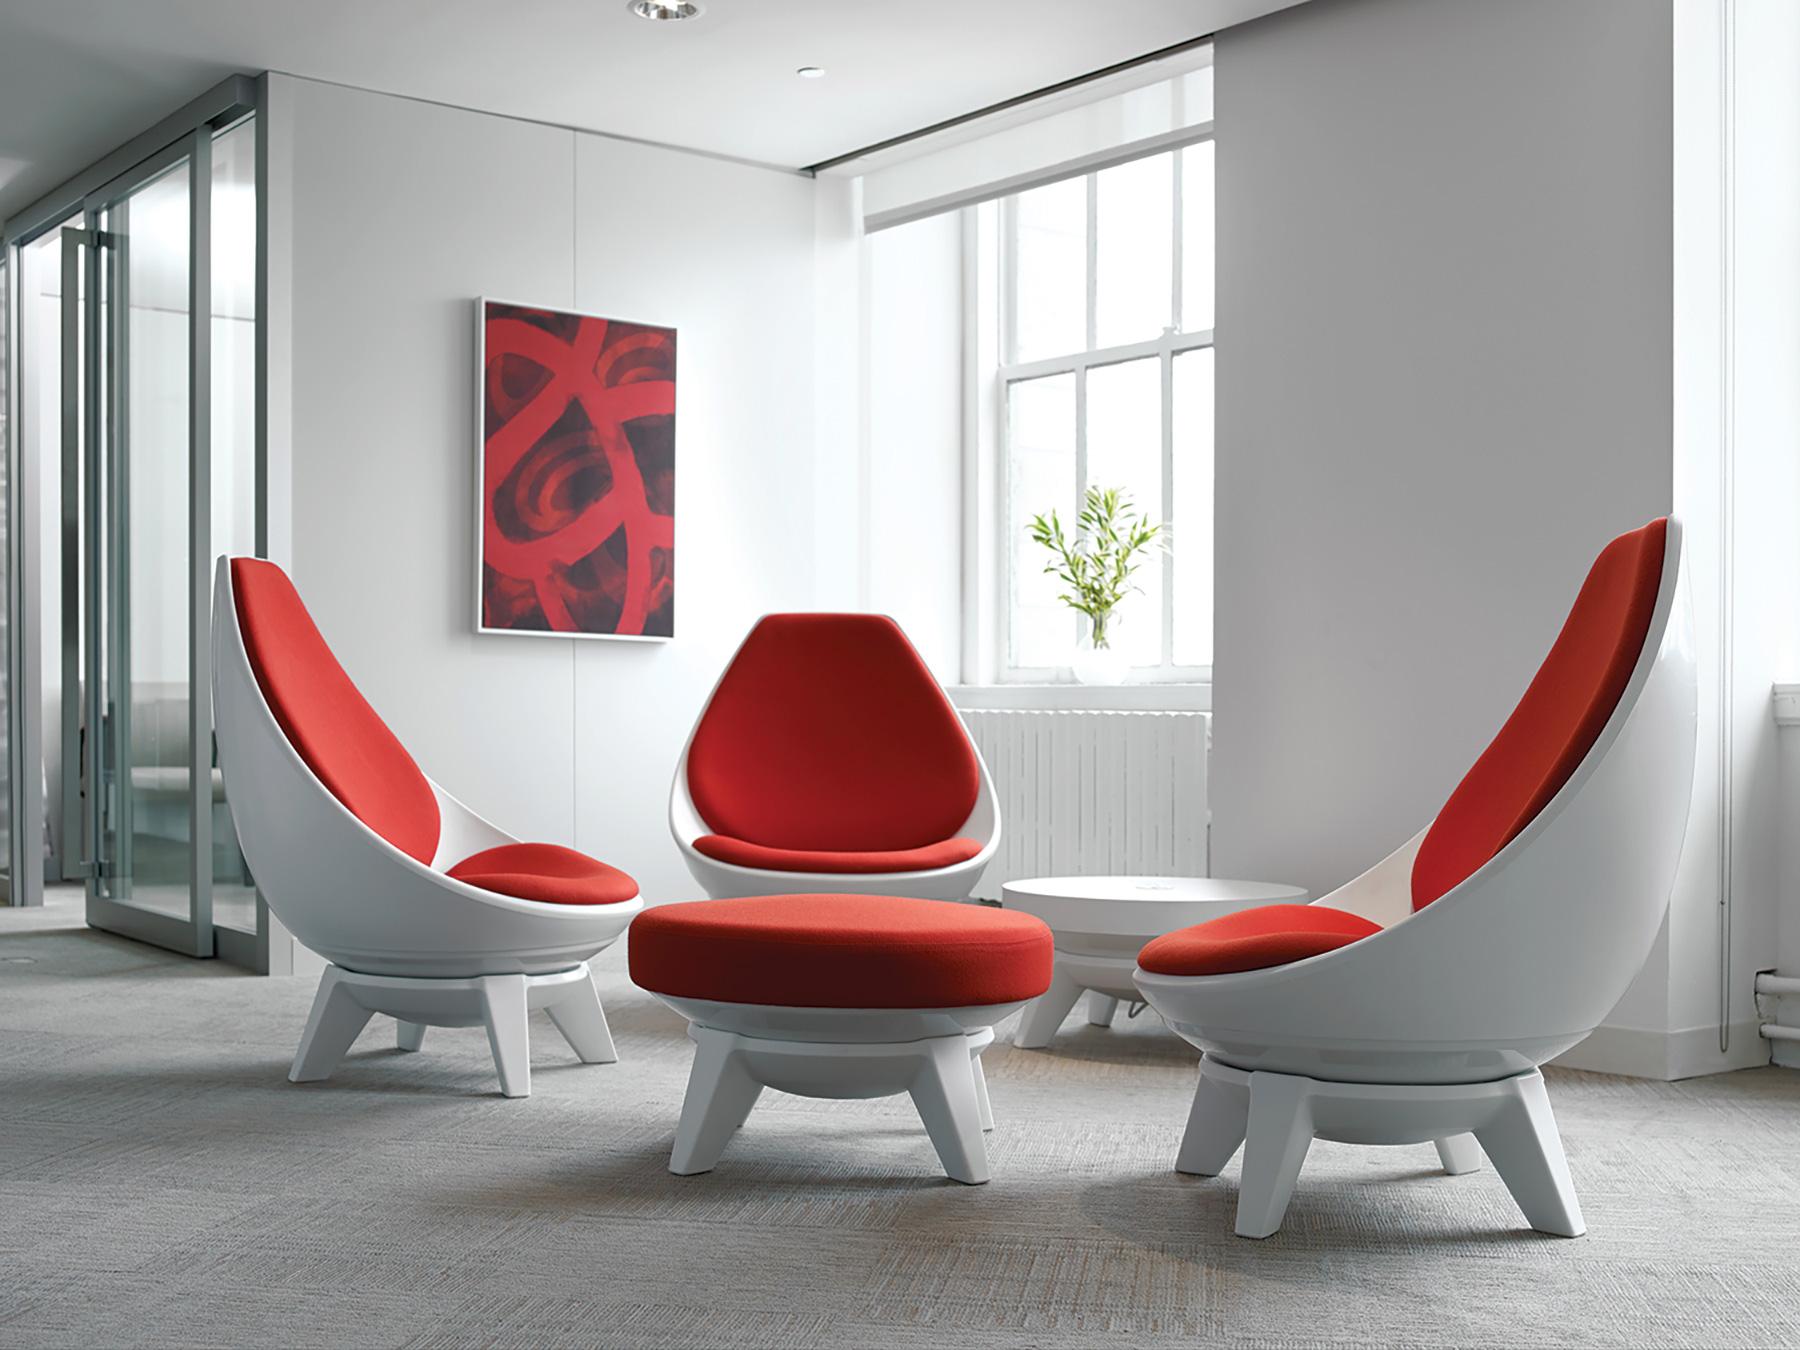 Ki 174 Sway Lounge Seating Https Www Demcointeriors Com